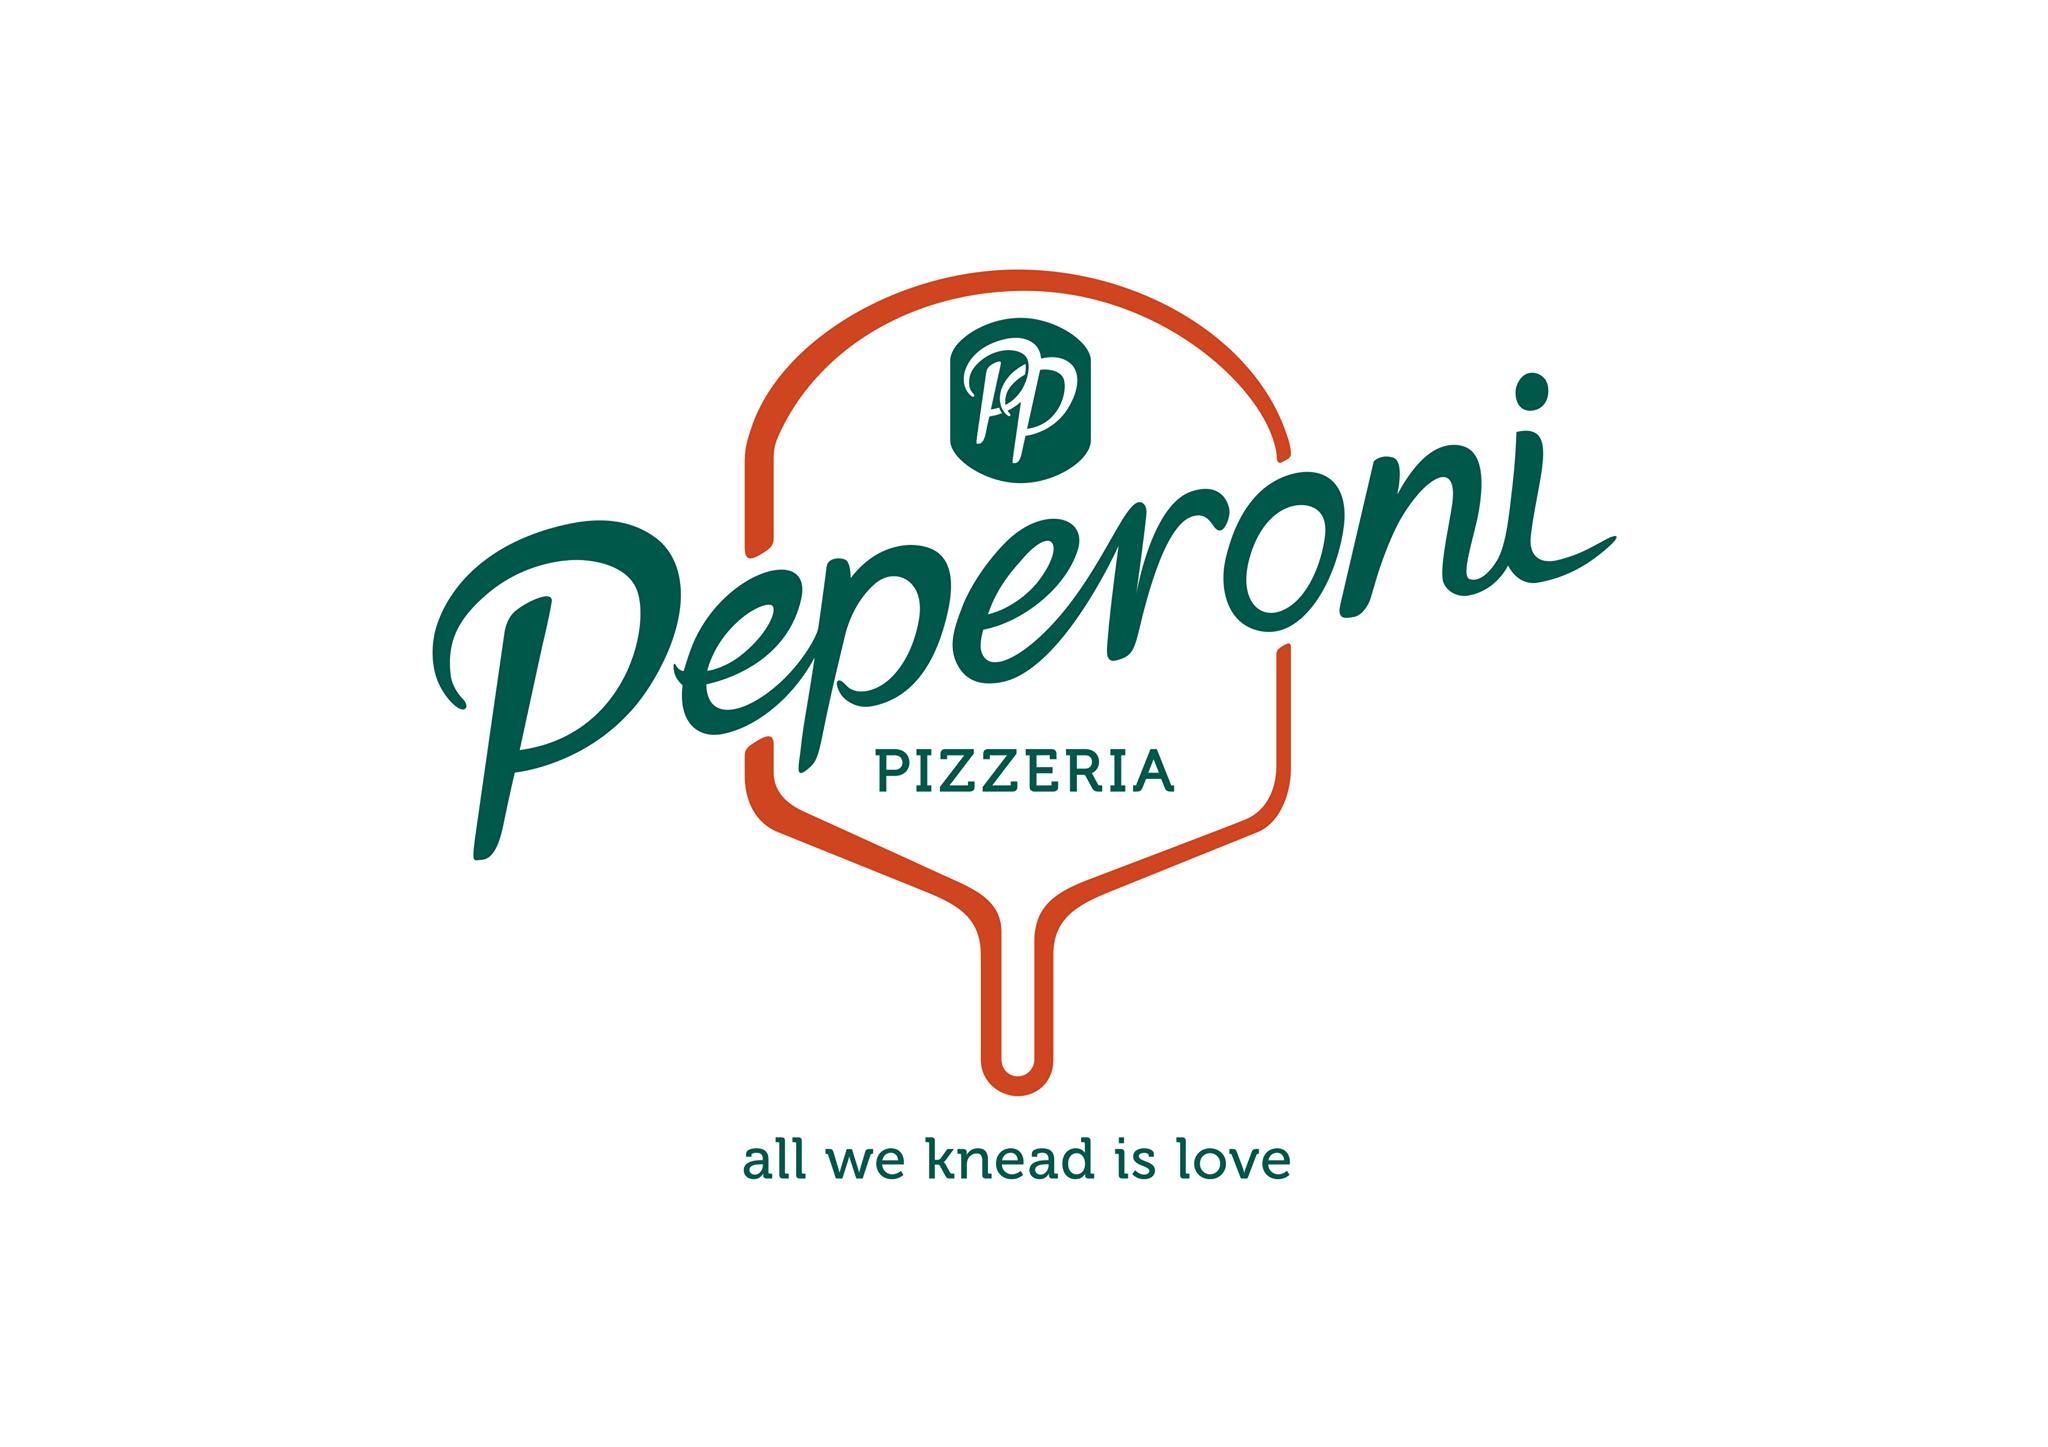 peperoni-pizza-logo